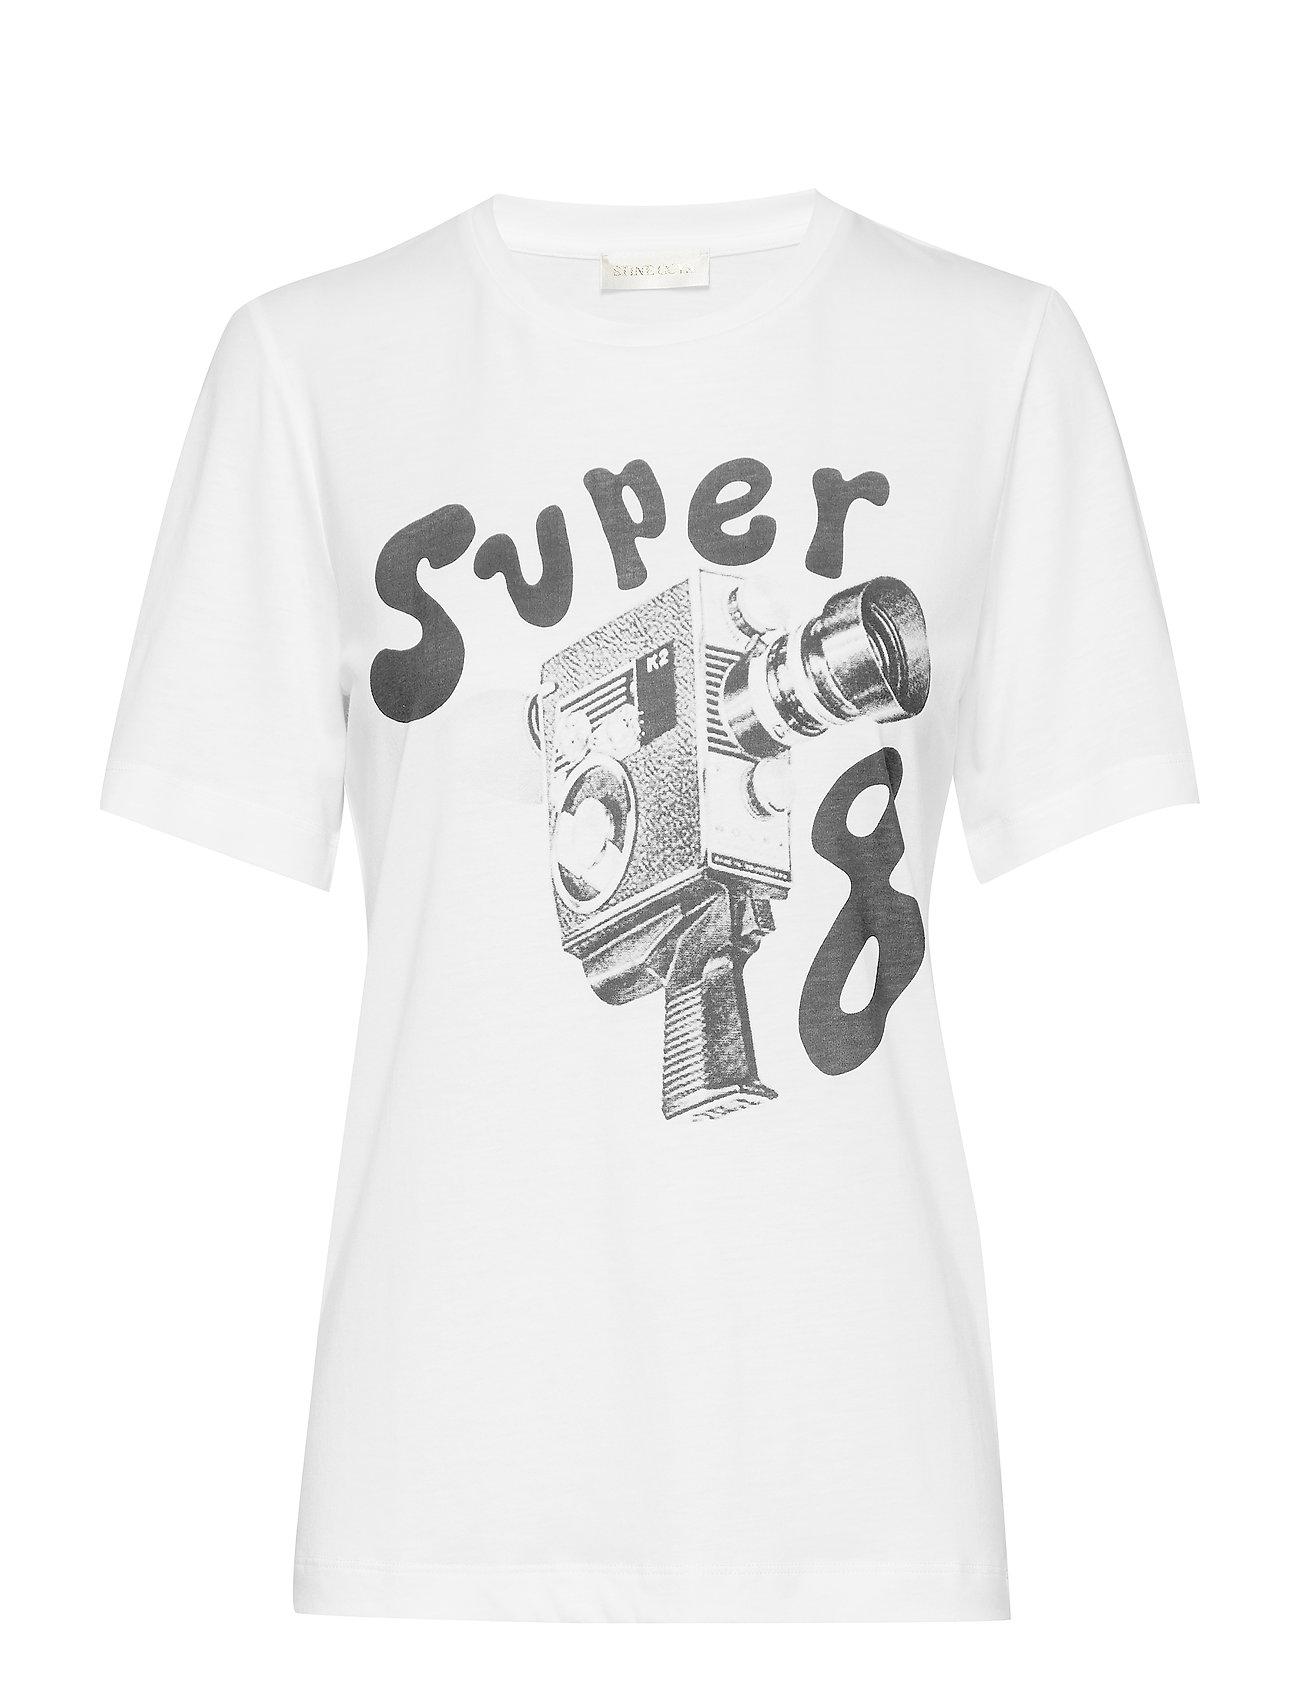 STINE GOYA Milo, 461 Printed Tee - SUPER 8